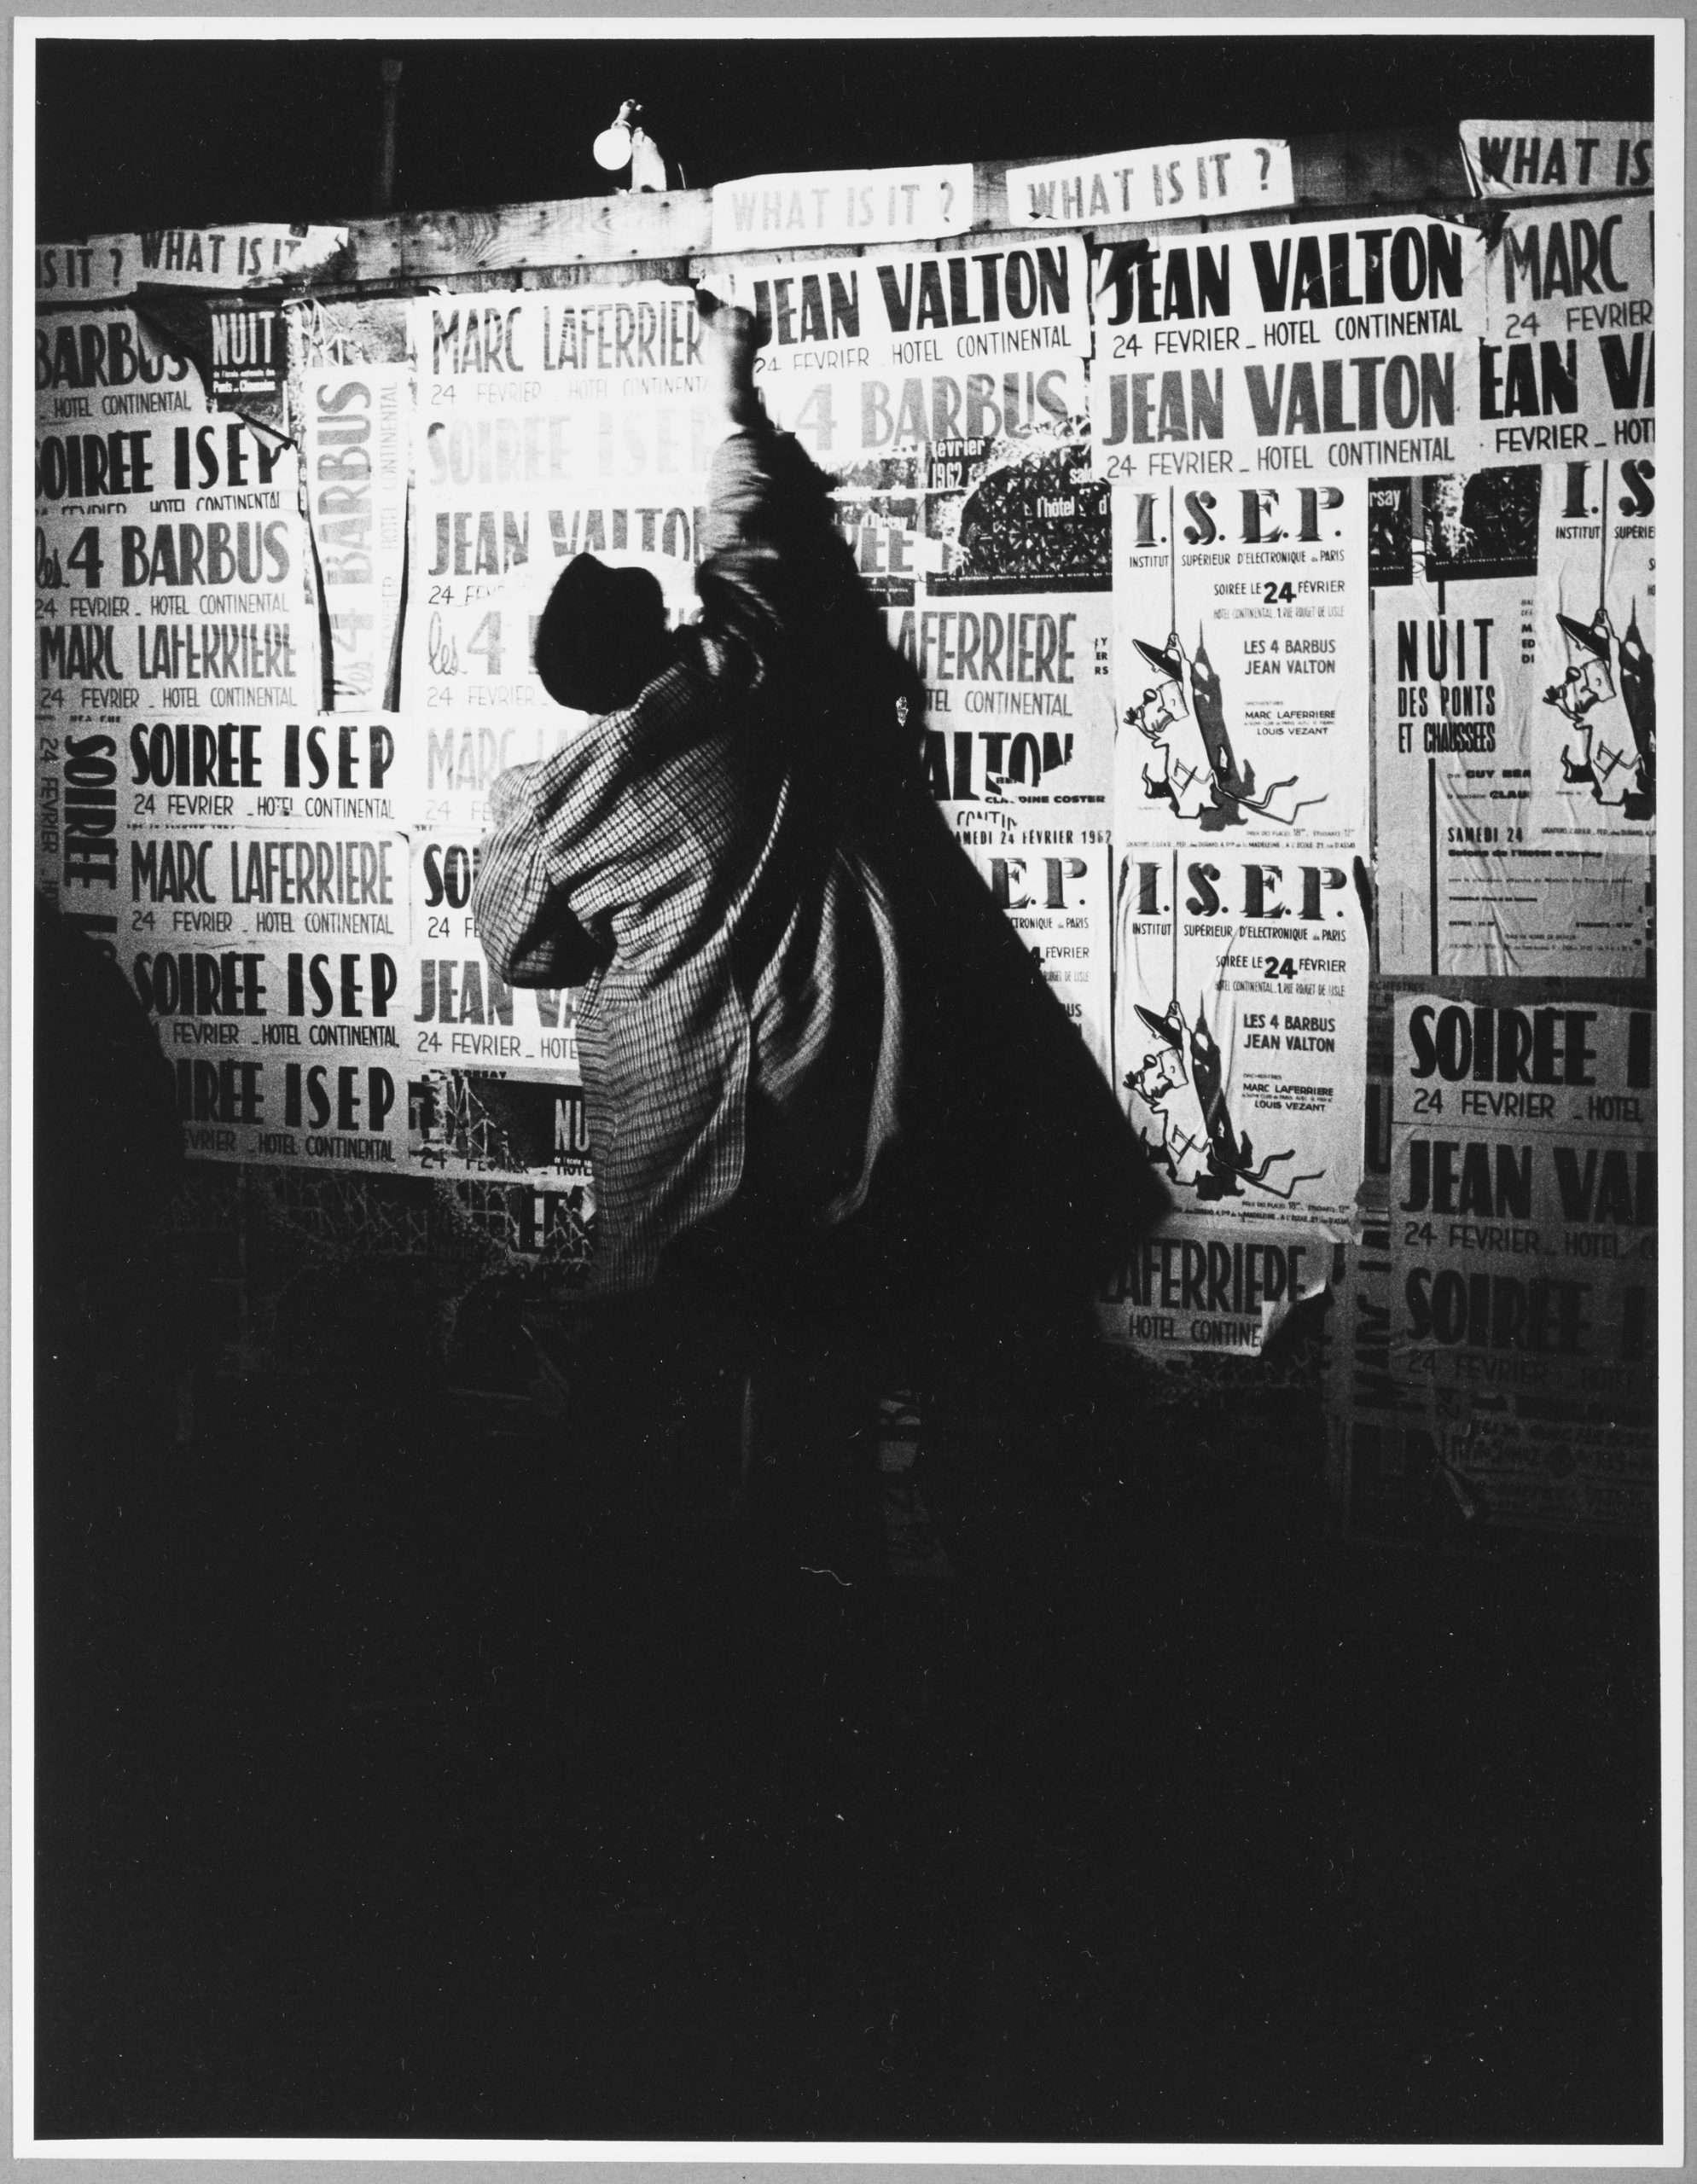 08. Shunk-Kender_Mimmo Rotella, Parigi, 1962